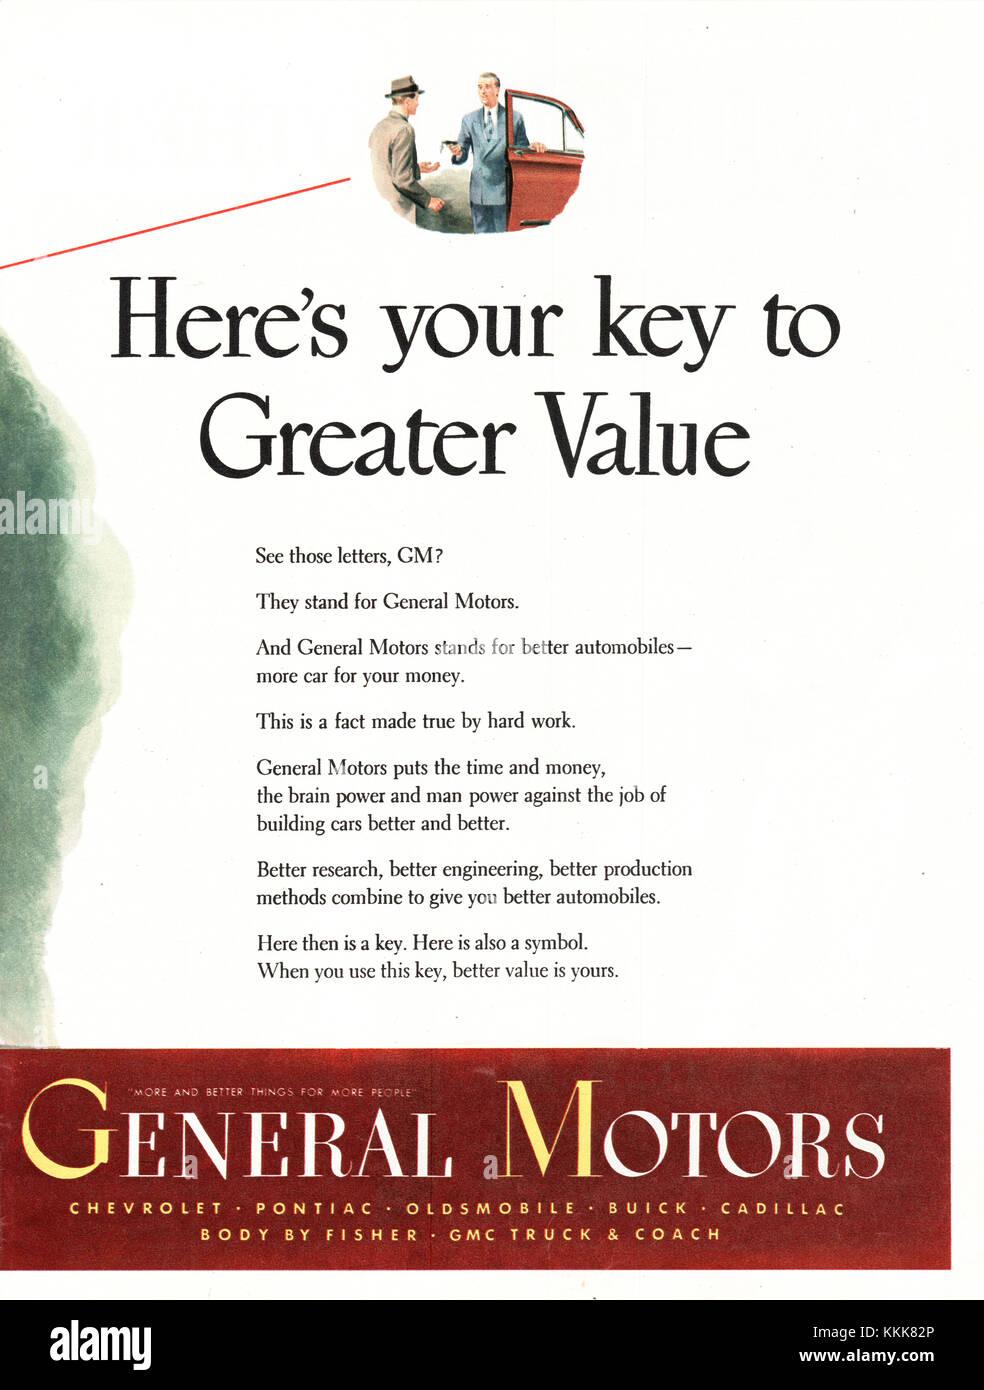 1948 U.S. Magazine General Motors Advert - Stock Image